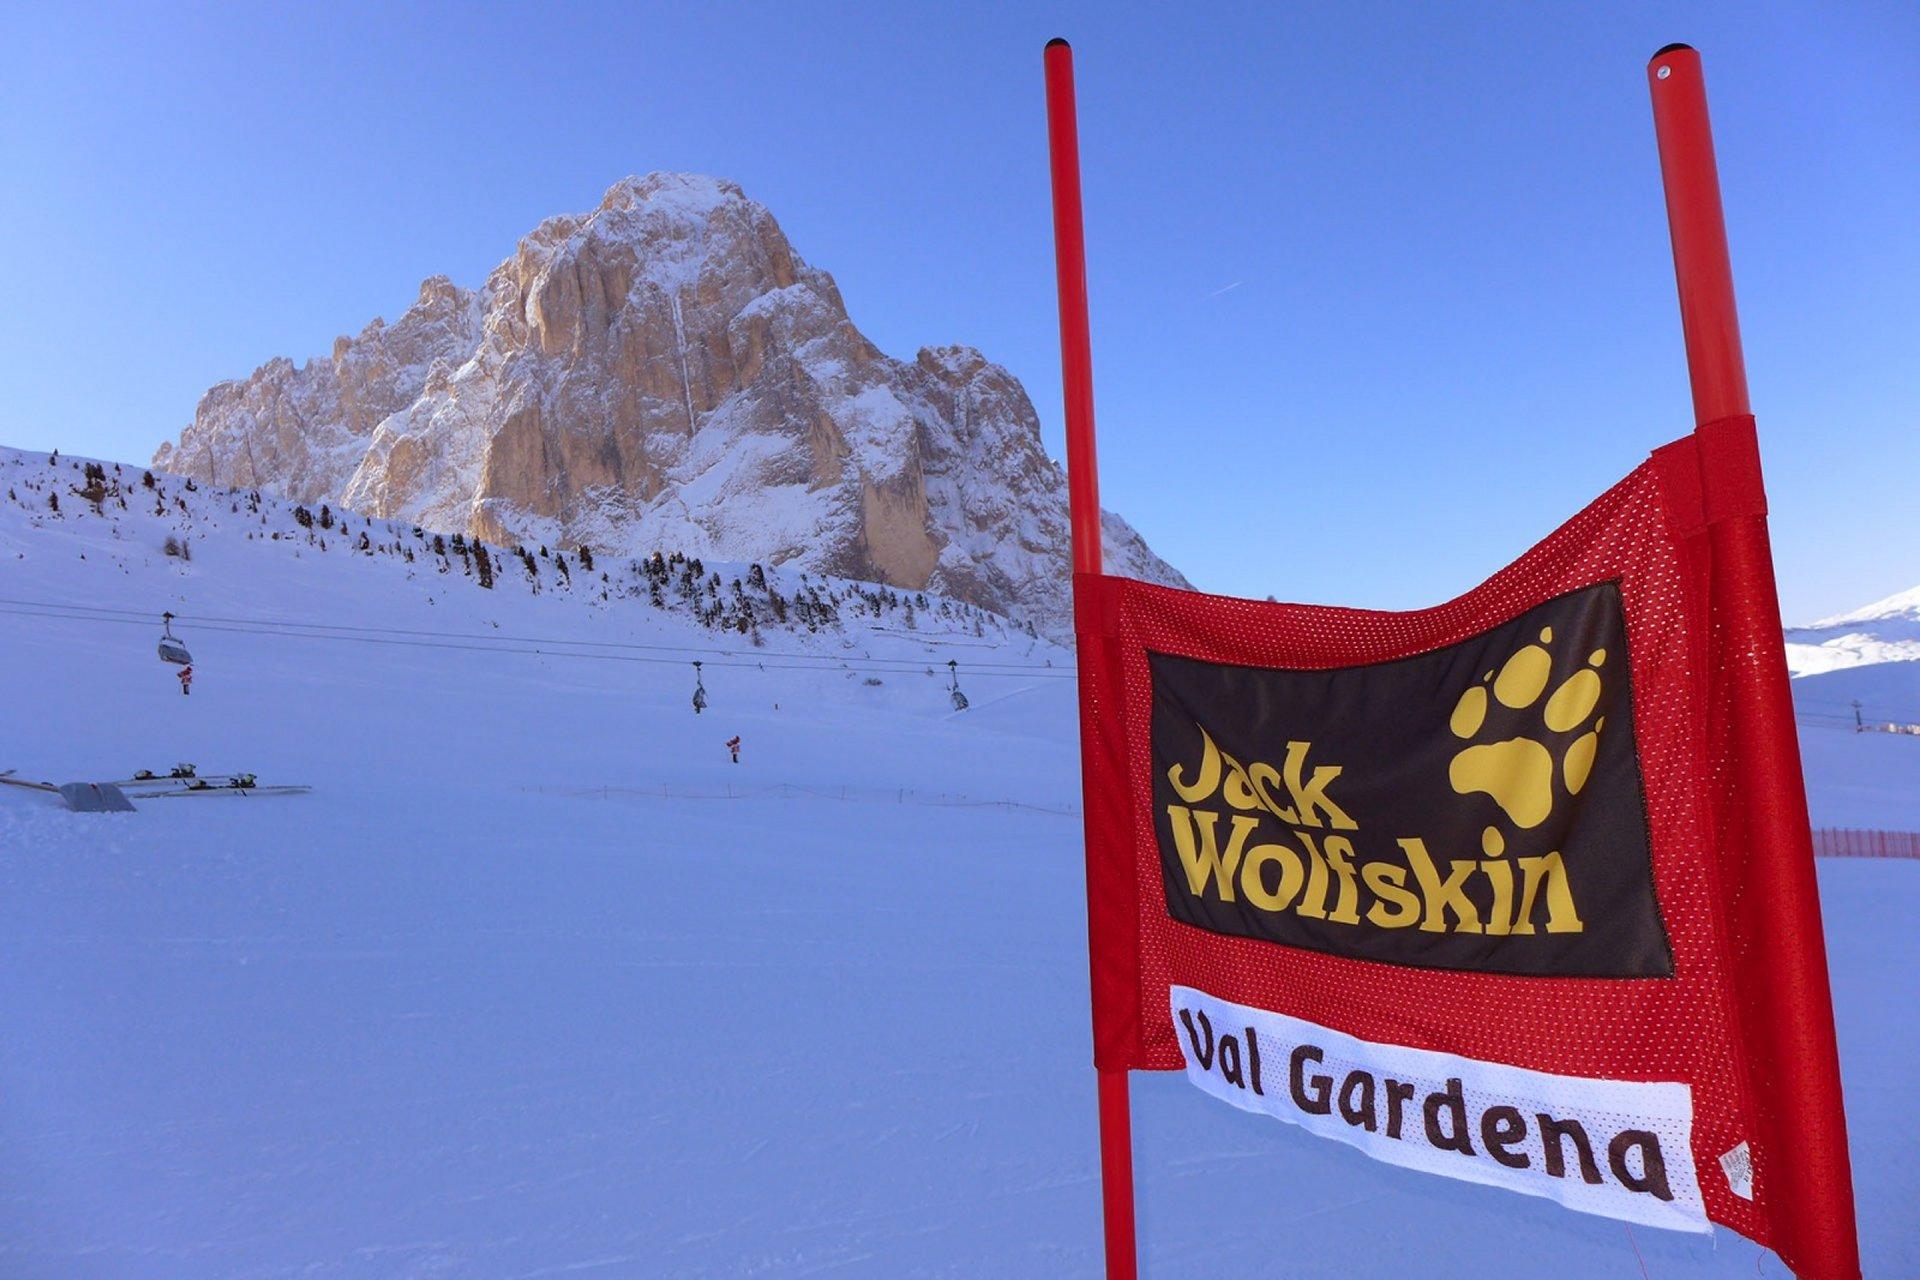 Saslong pronta: confermate le gare di Coppa del Mondo in Val Gardena